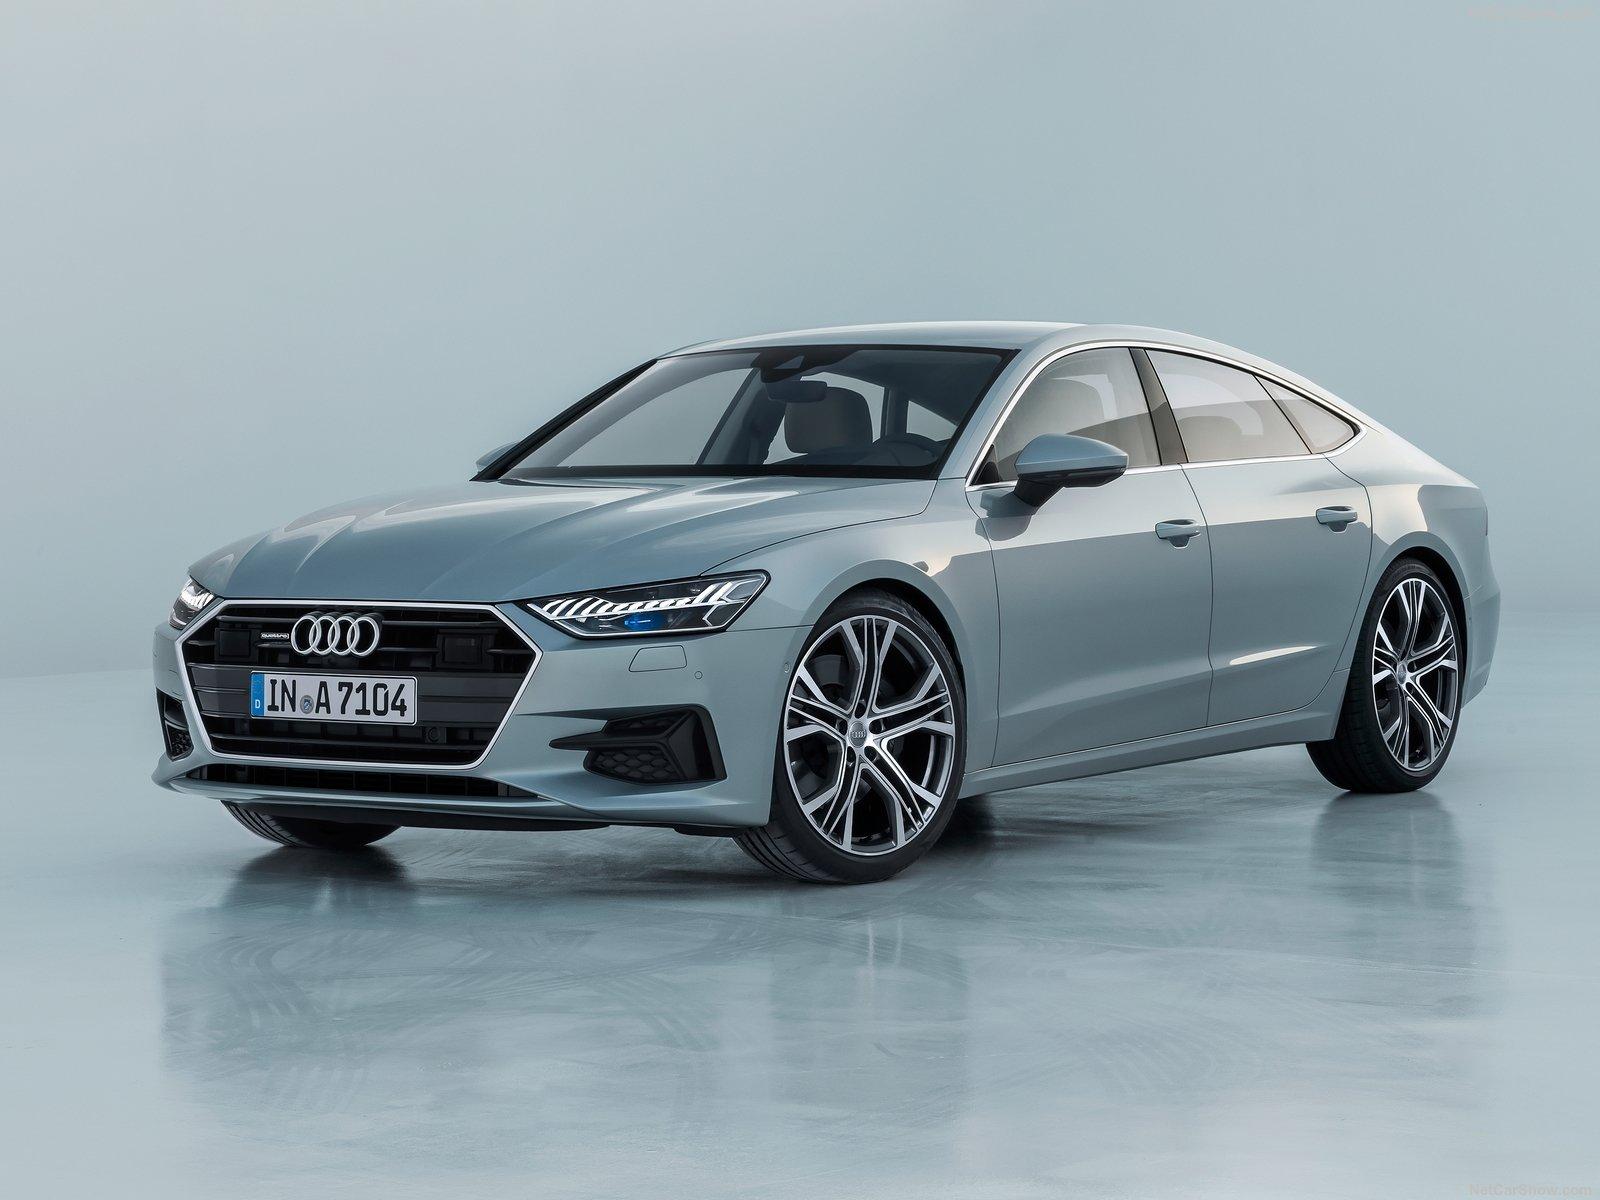 2017 - [Audi] A7 Sportback II - Page 6 Audi-a20